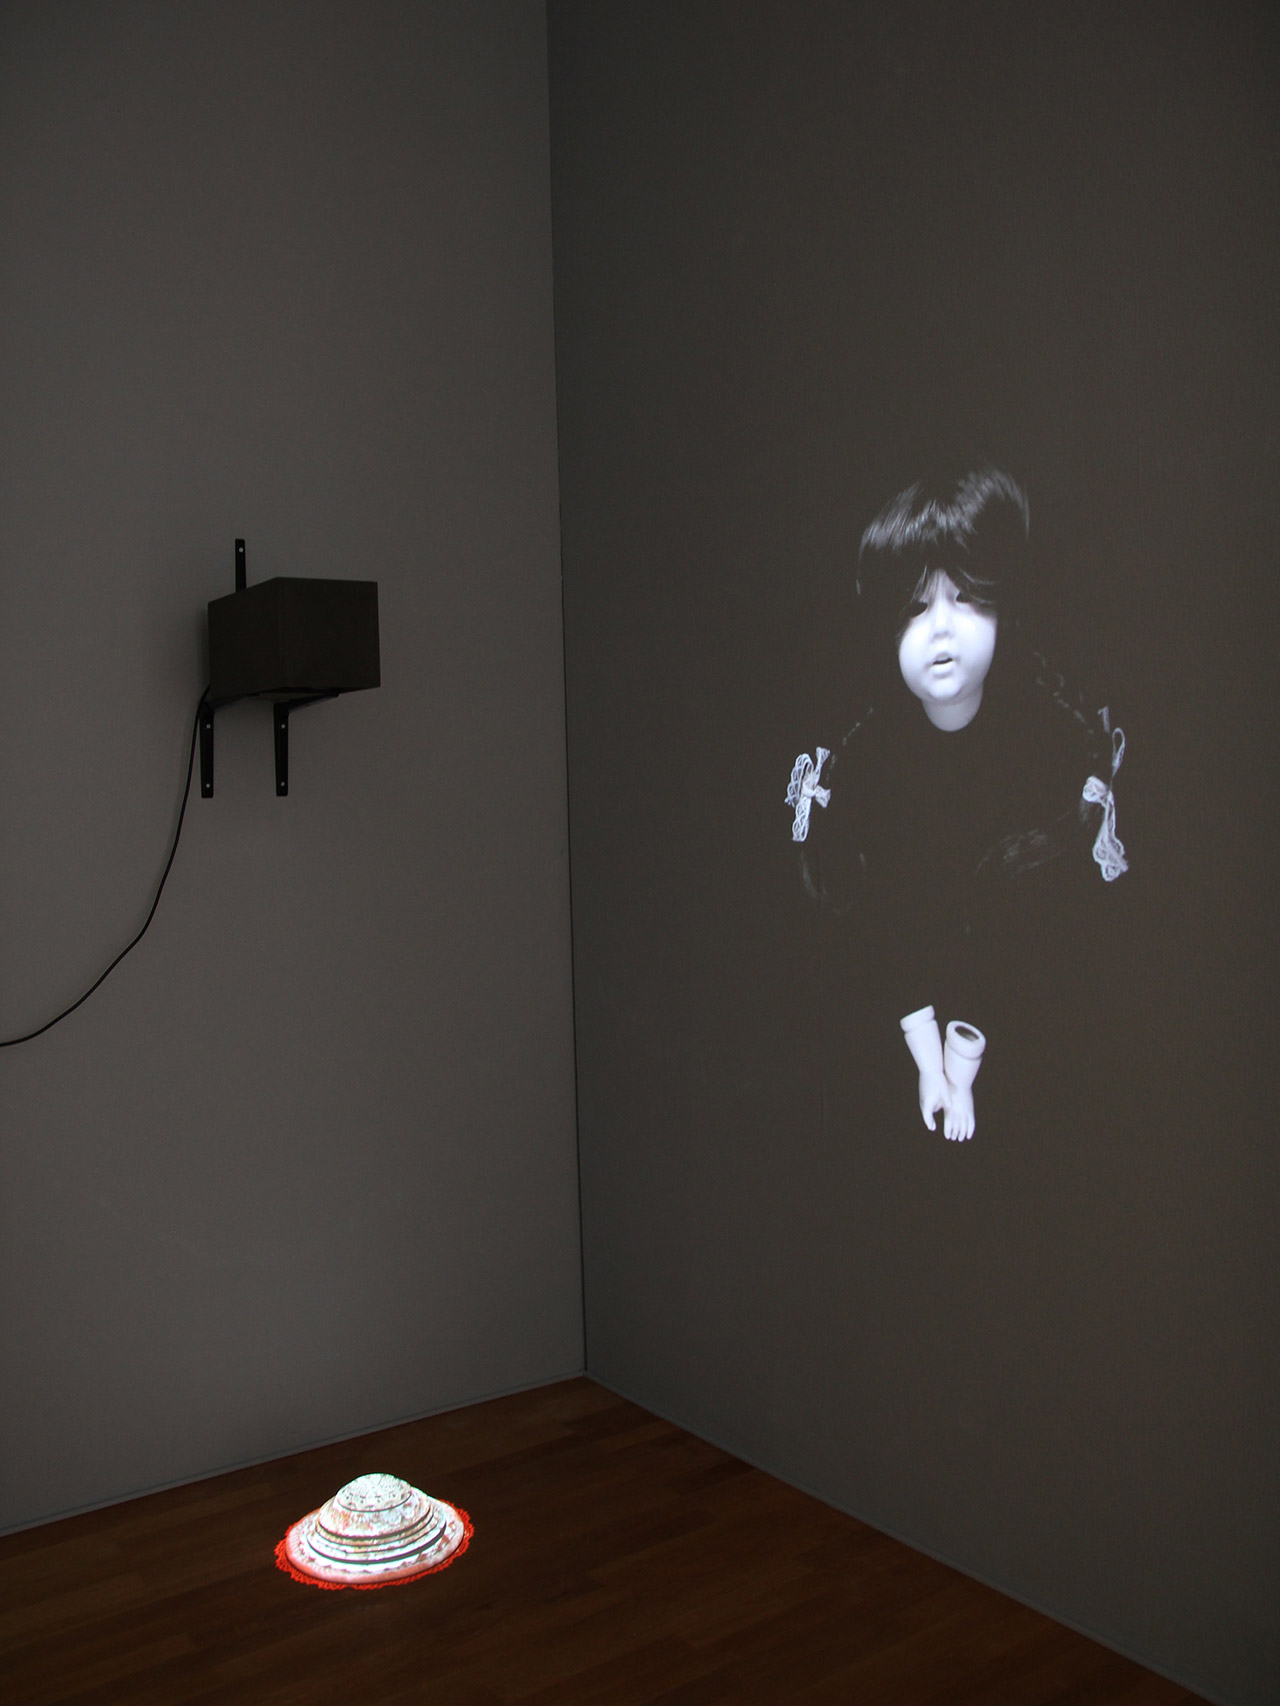 Dezember-Ausstellung-Kunsthalle-Winterthur-2013-5.jpg